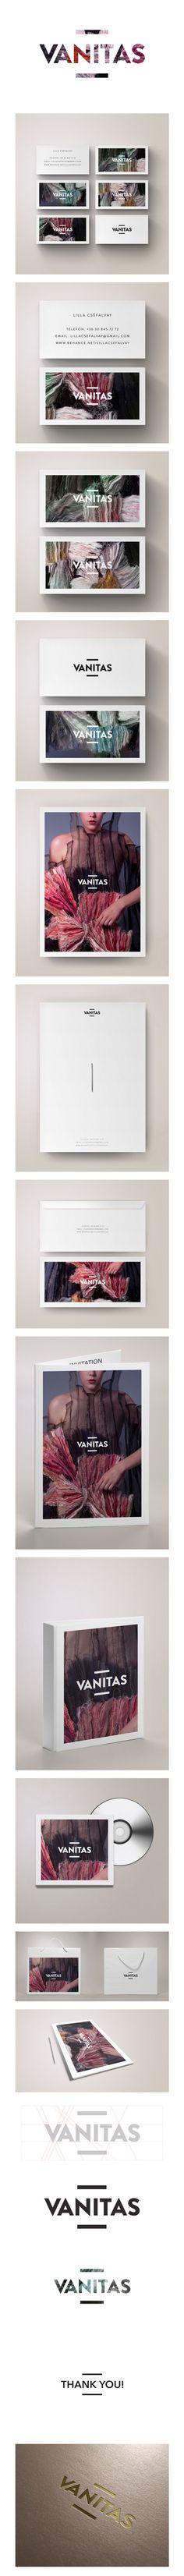 minimalist design, invitation design, graphic design, business cards, brand identity, corporate identity, vanita, corporate branding, fashion designers